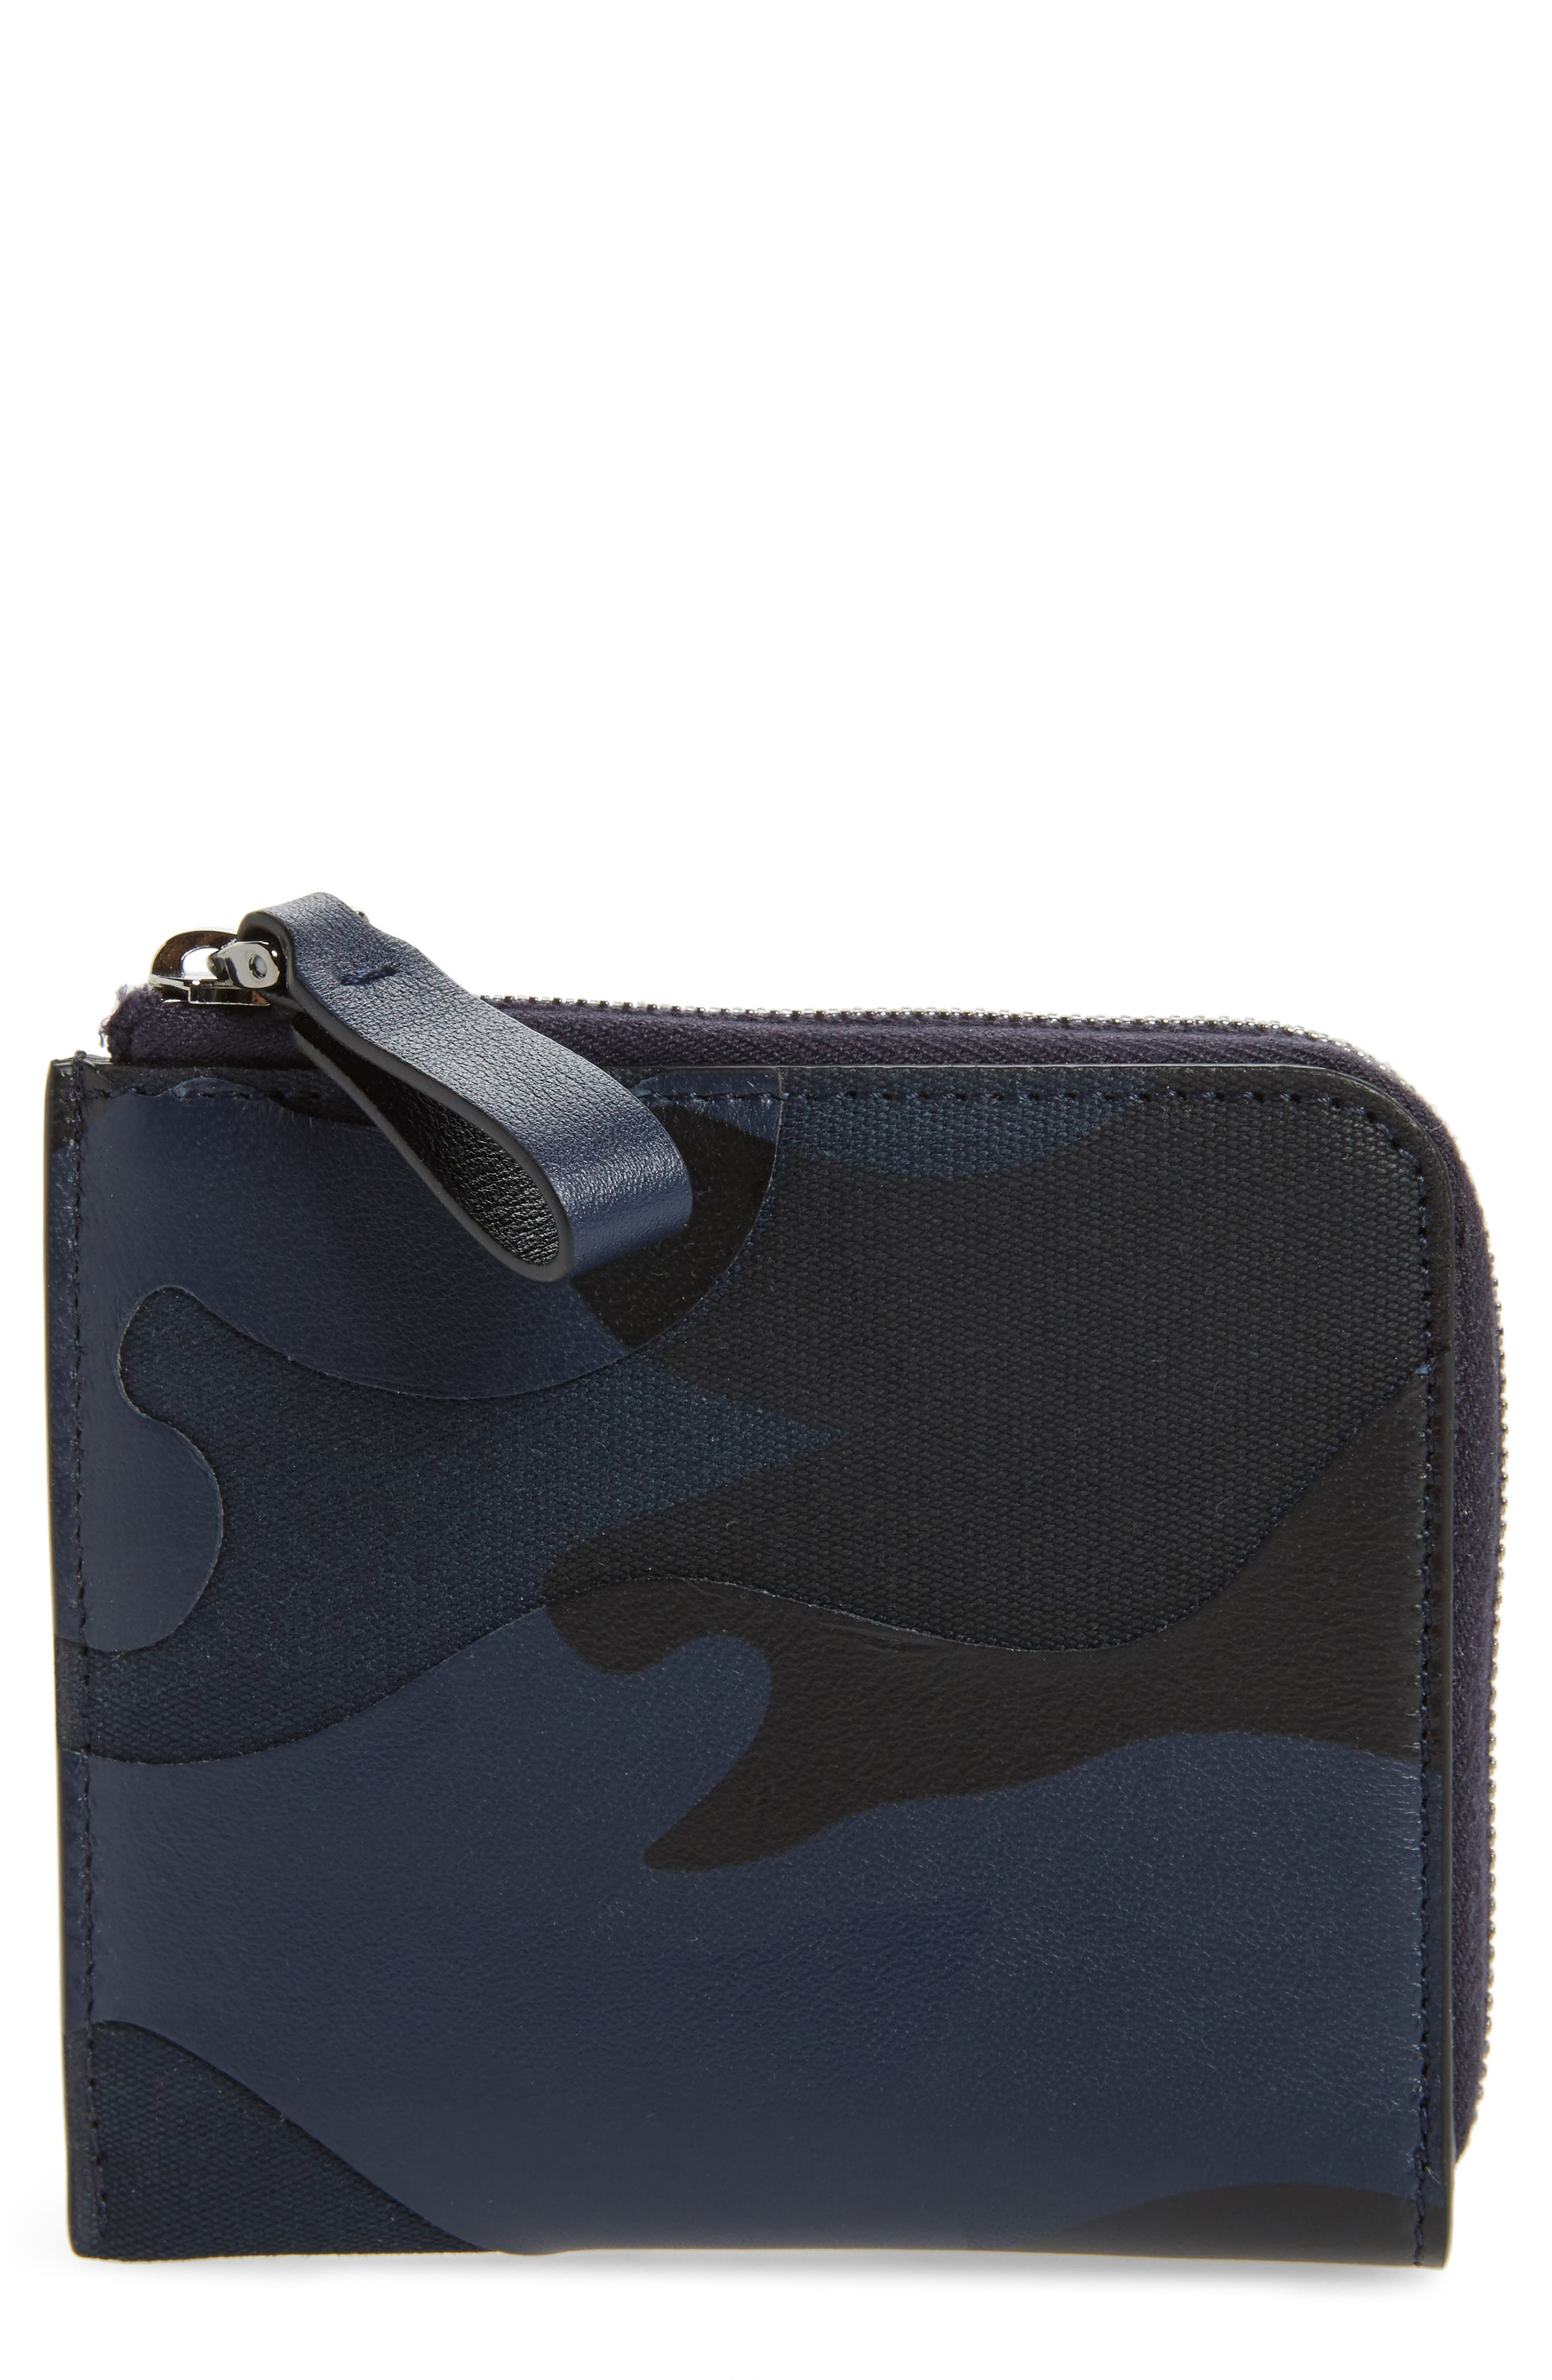 GARAVANI Camo Zip Wallet,                             Main thumbnail 1, color,                             MARINE